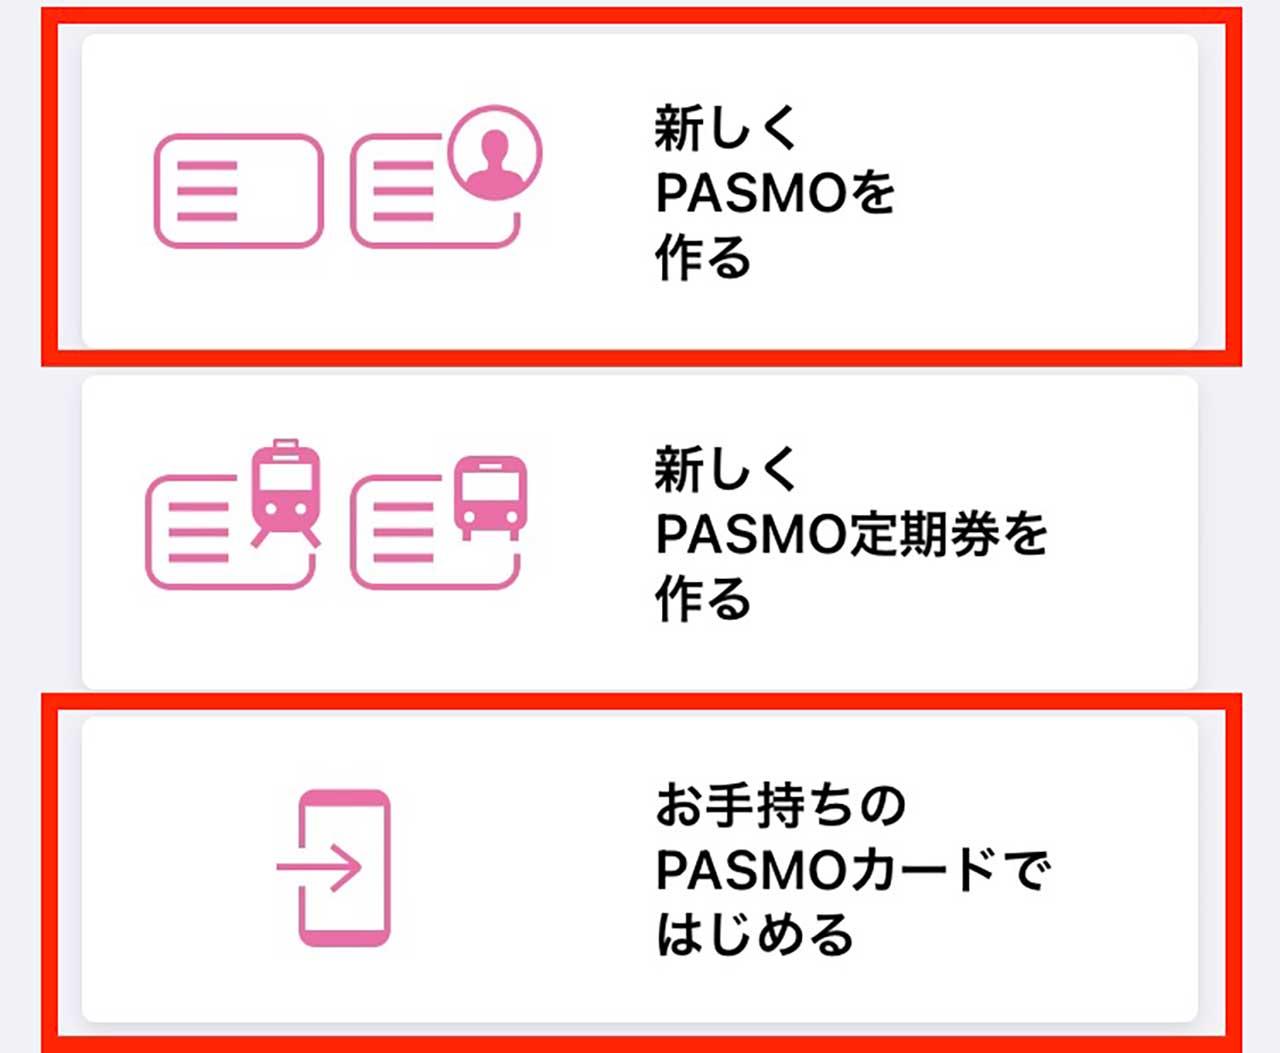 PASMOを作り、ApplePayに登録